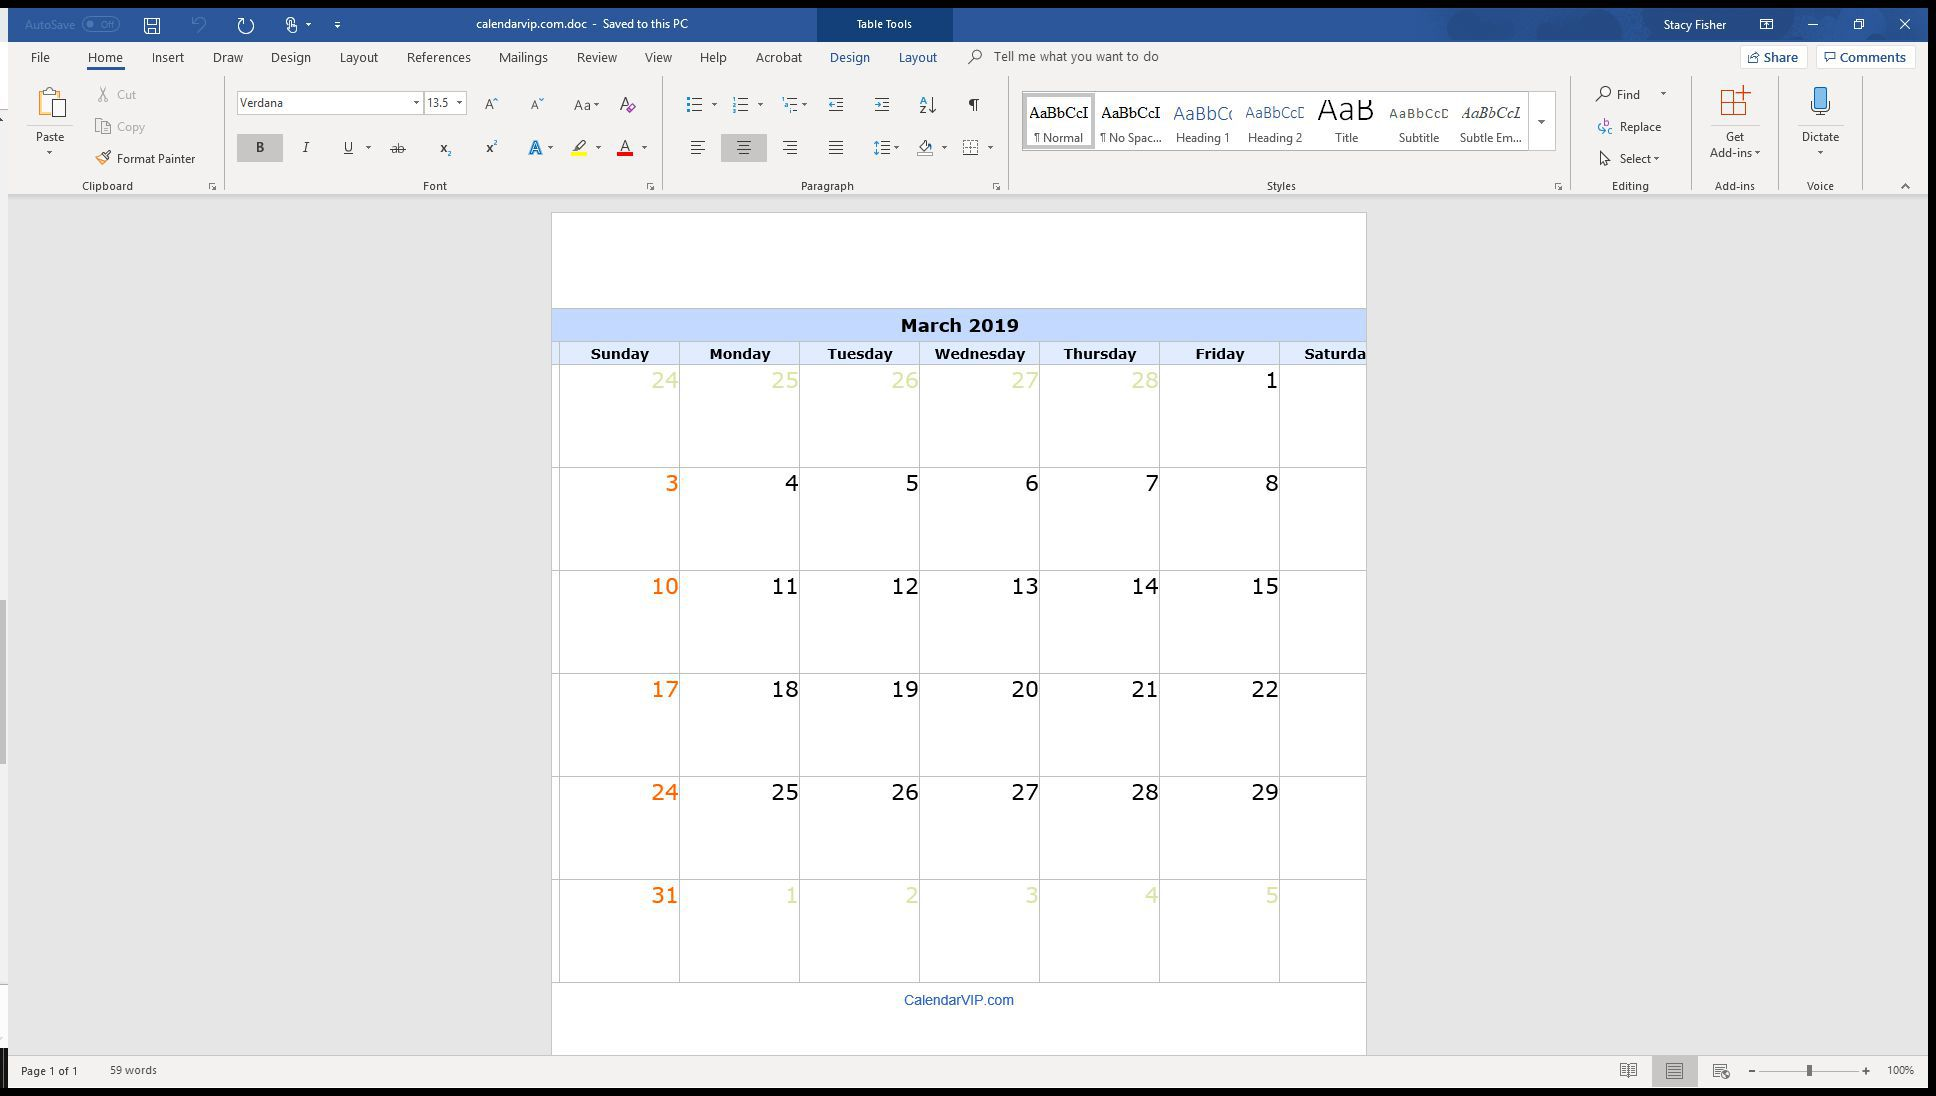 004 Surprising Calendar Template For Word 2007 Design Full